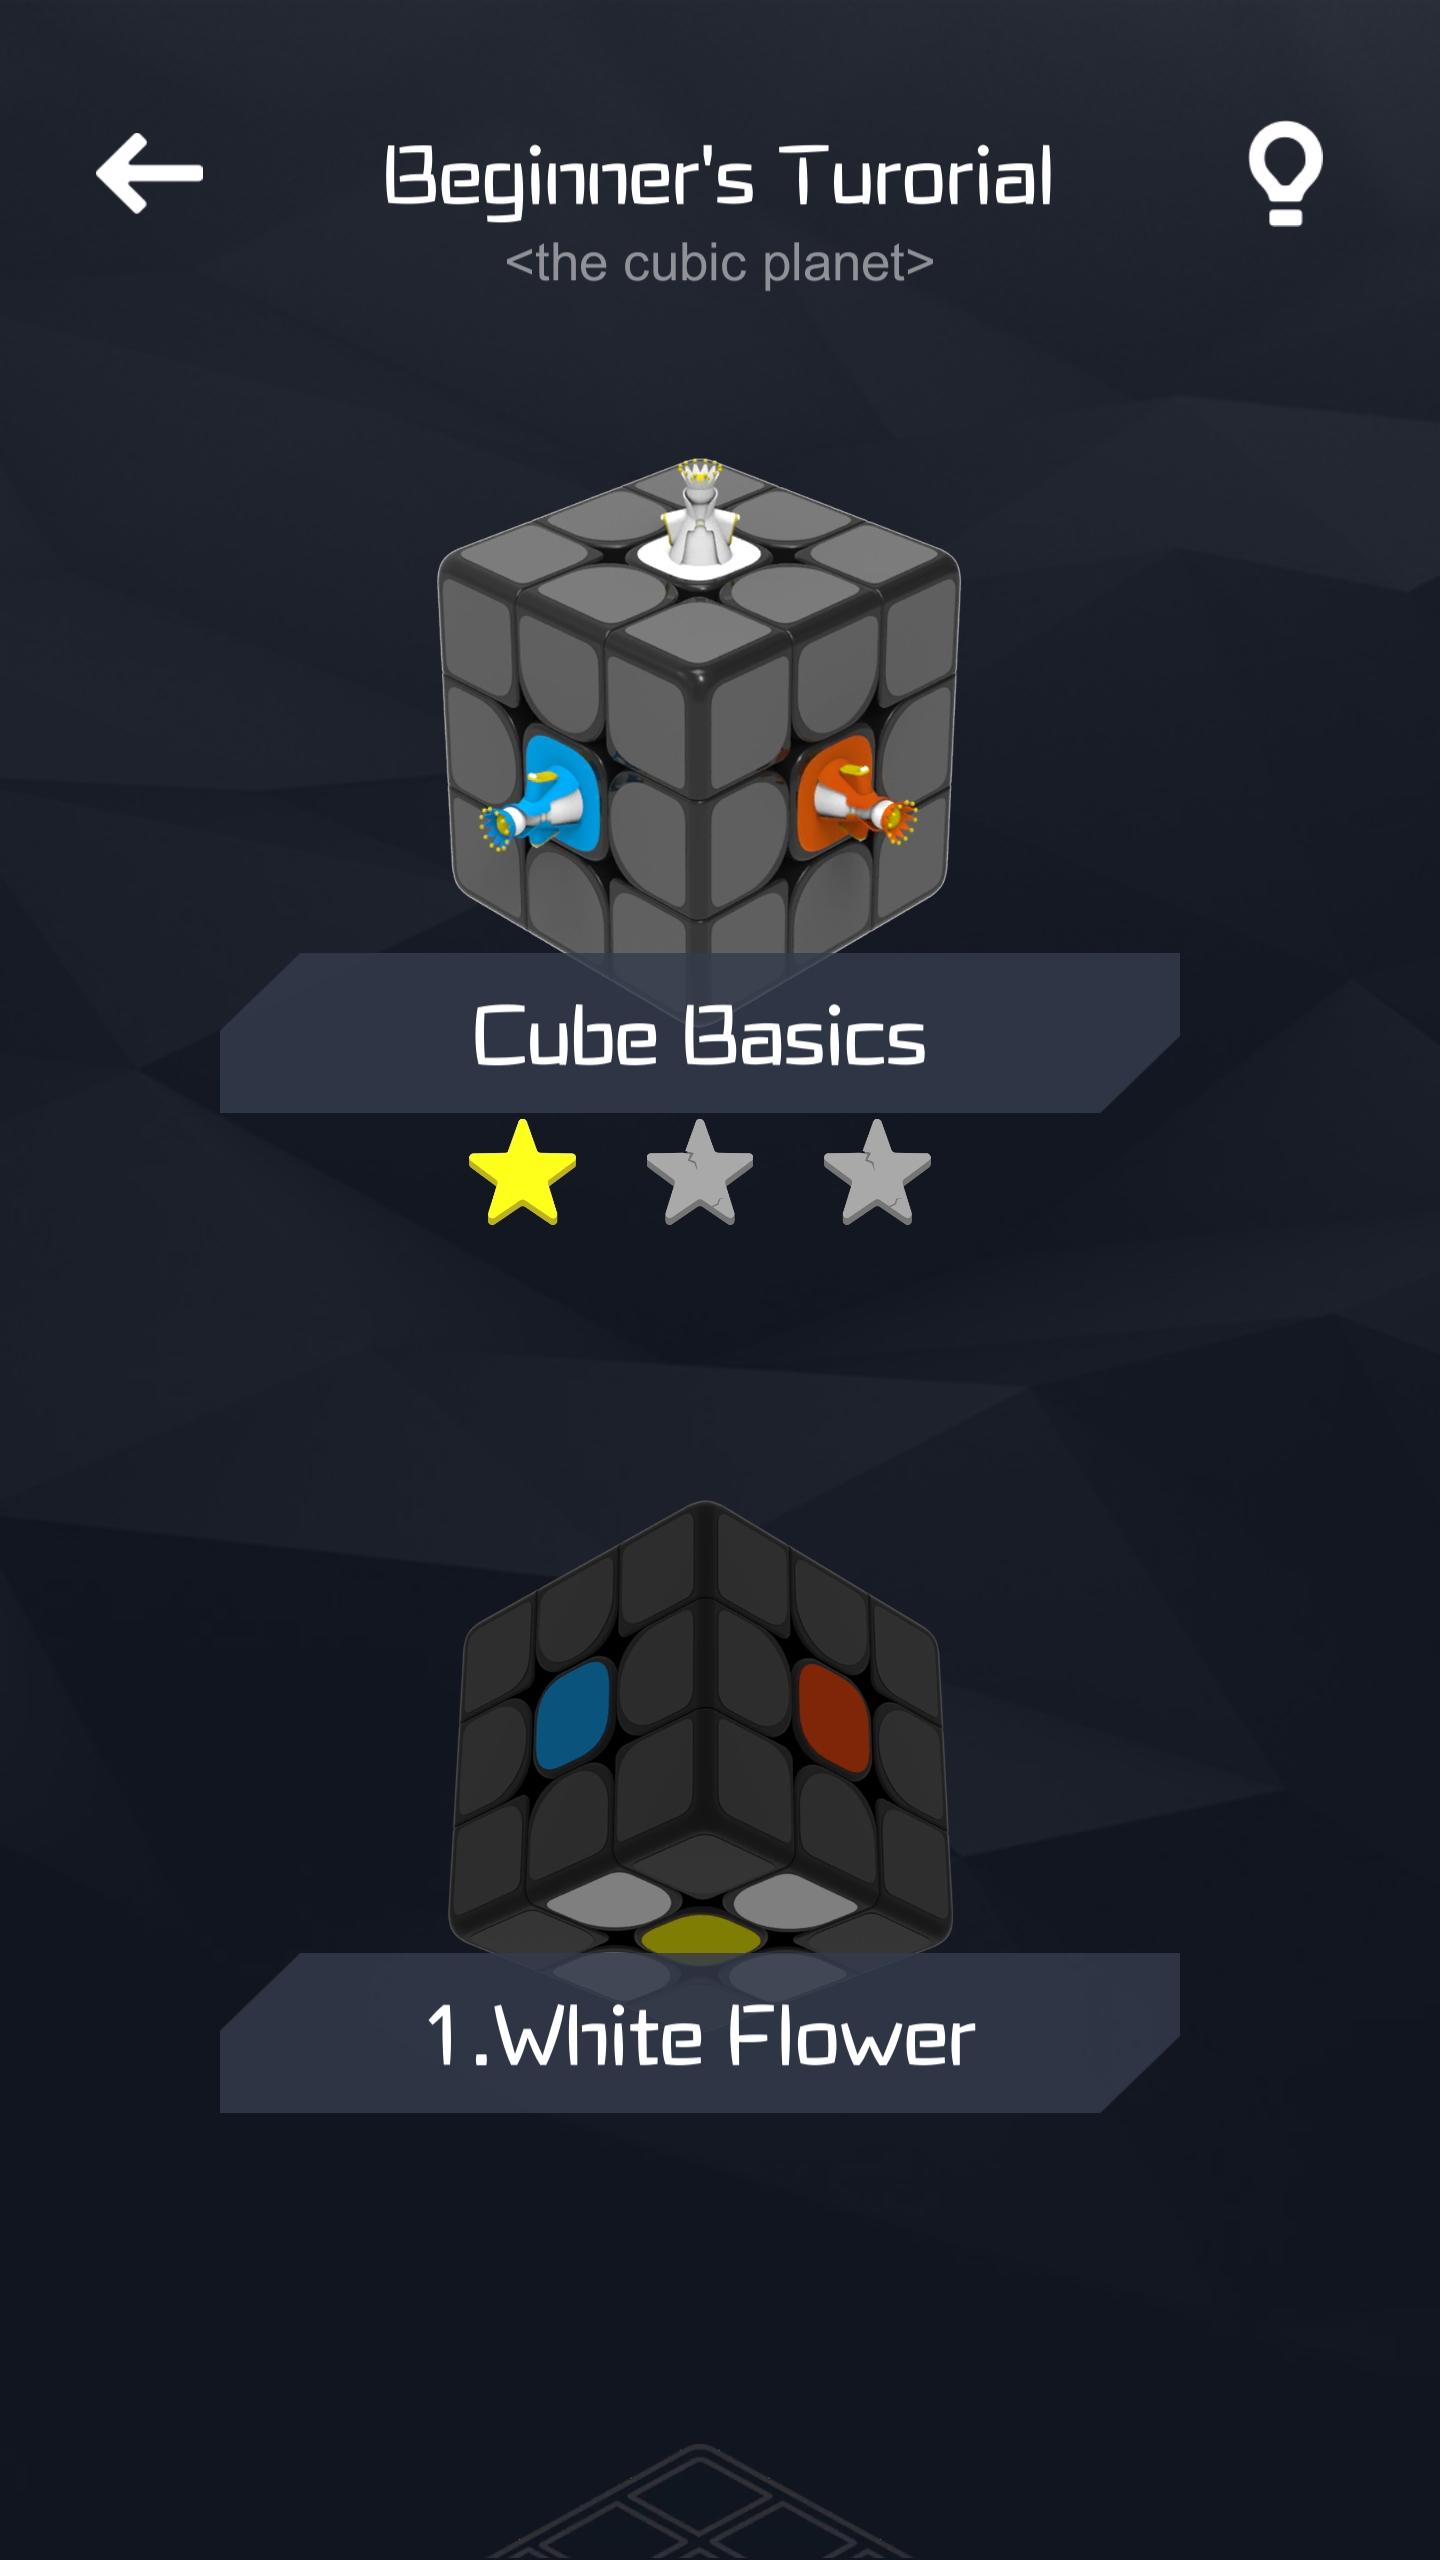 xiaomi-rubik-kocka-giiker-geeker-okoskocka-varazskocka-magic-cube-teszt-05